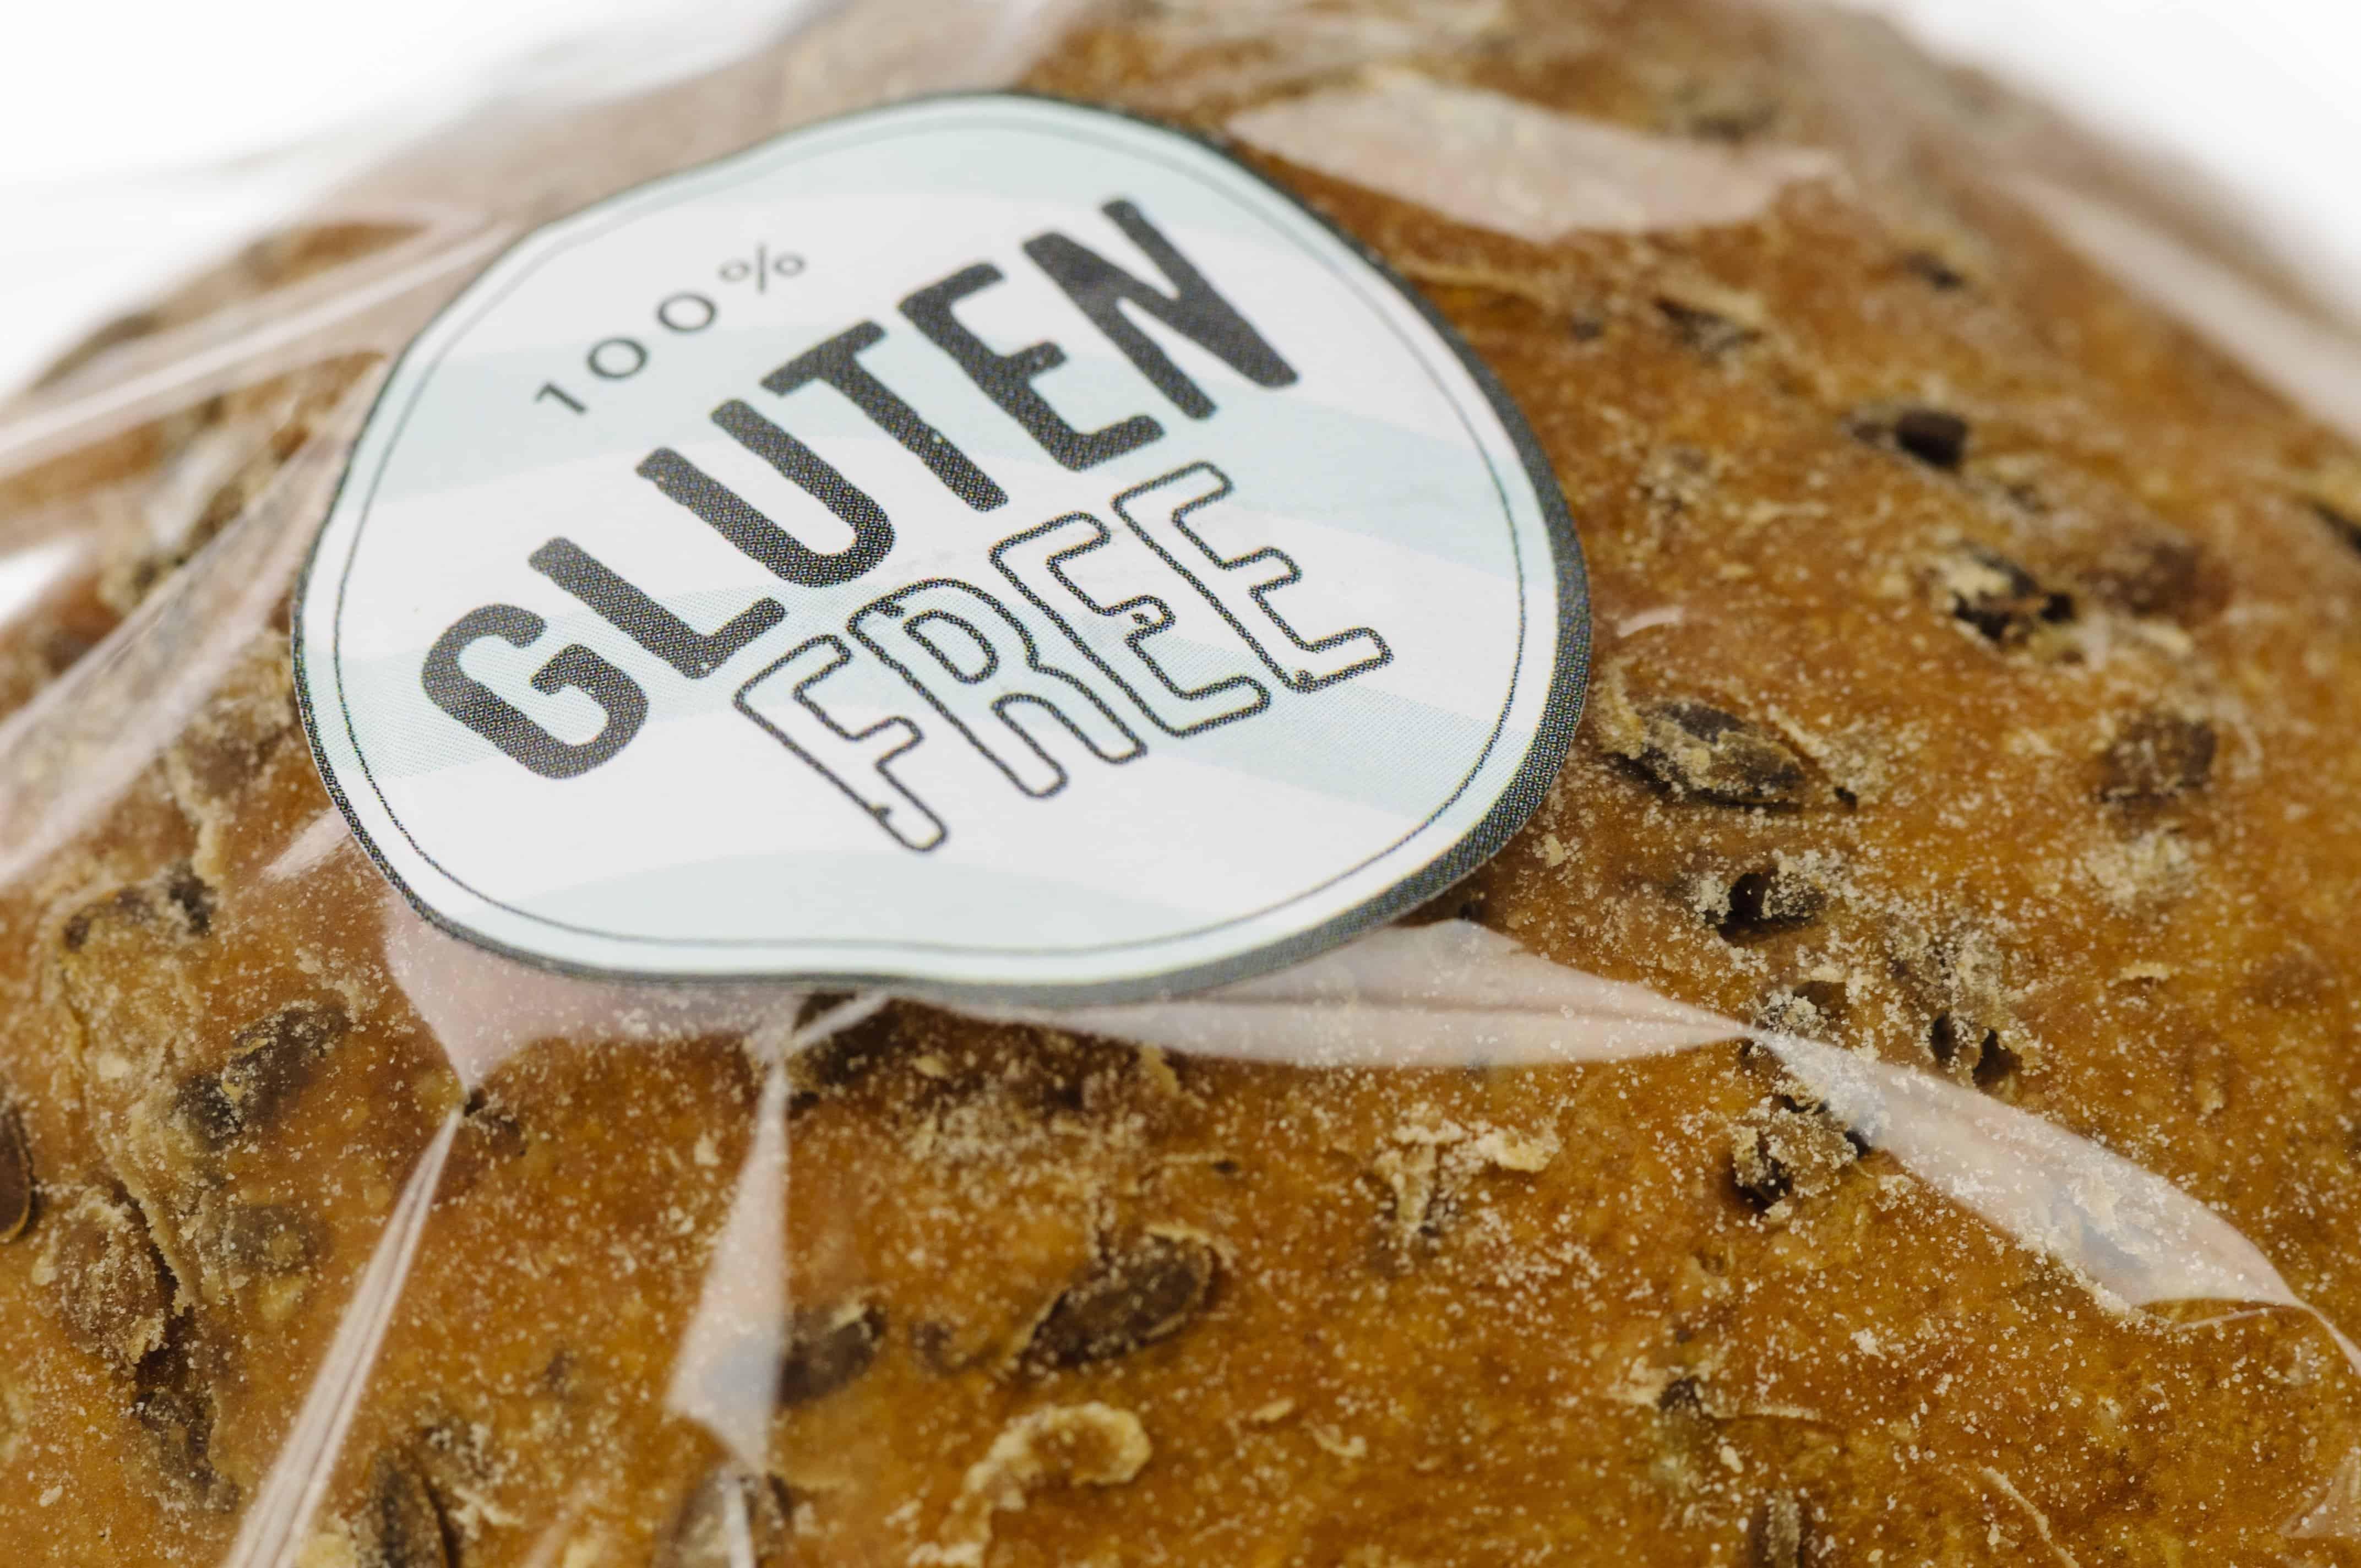 gluten free diet coeliac disease diagnosis tips